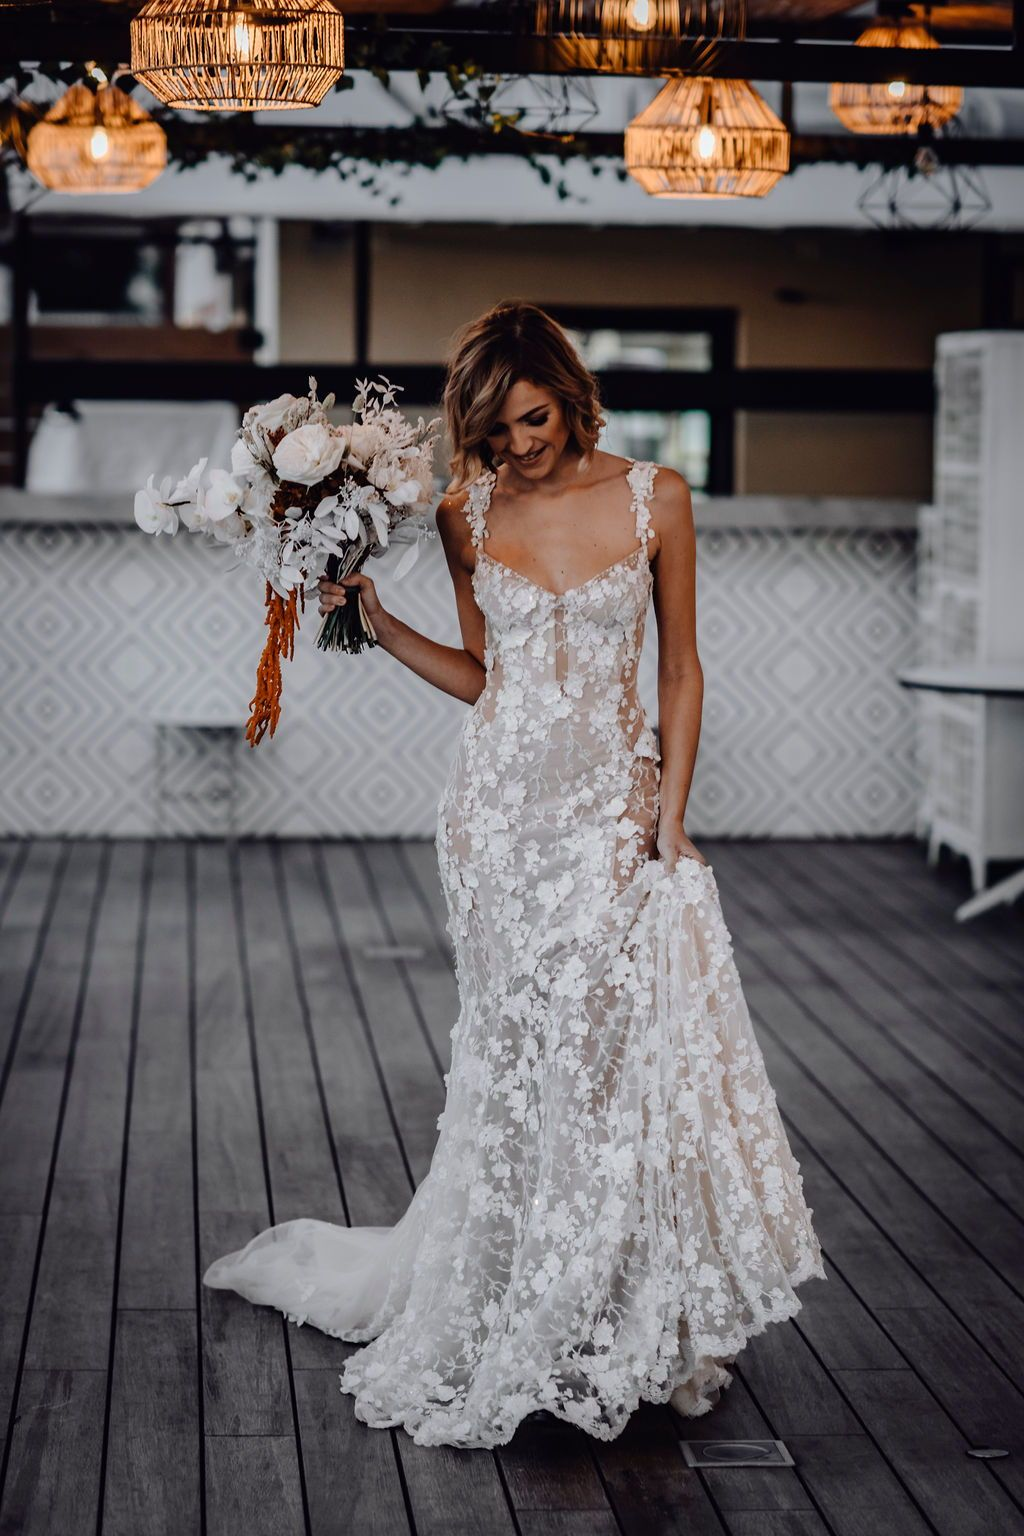 Galia Lahav - find your perfect wedding dress for your 2020 wedding